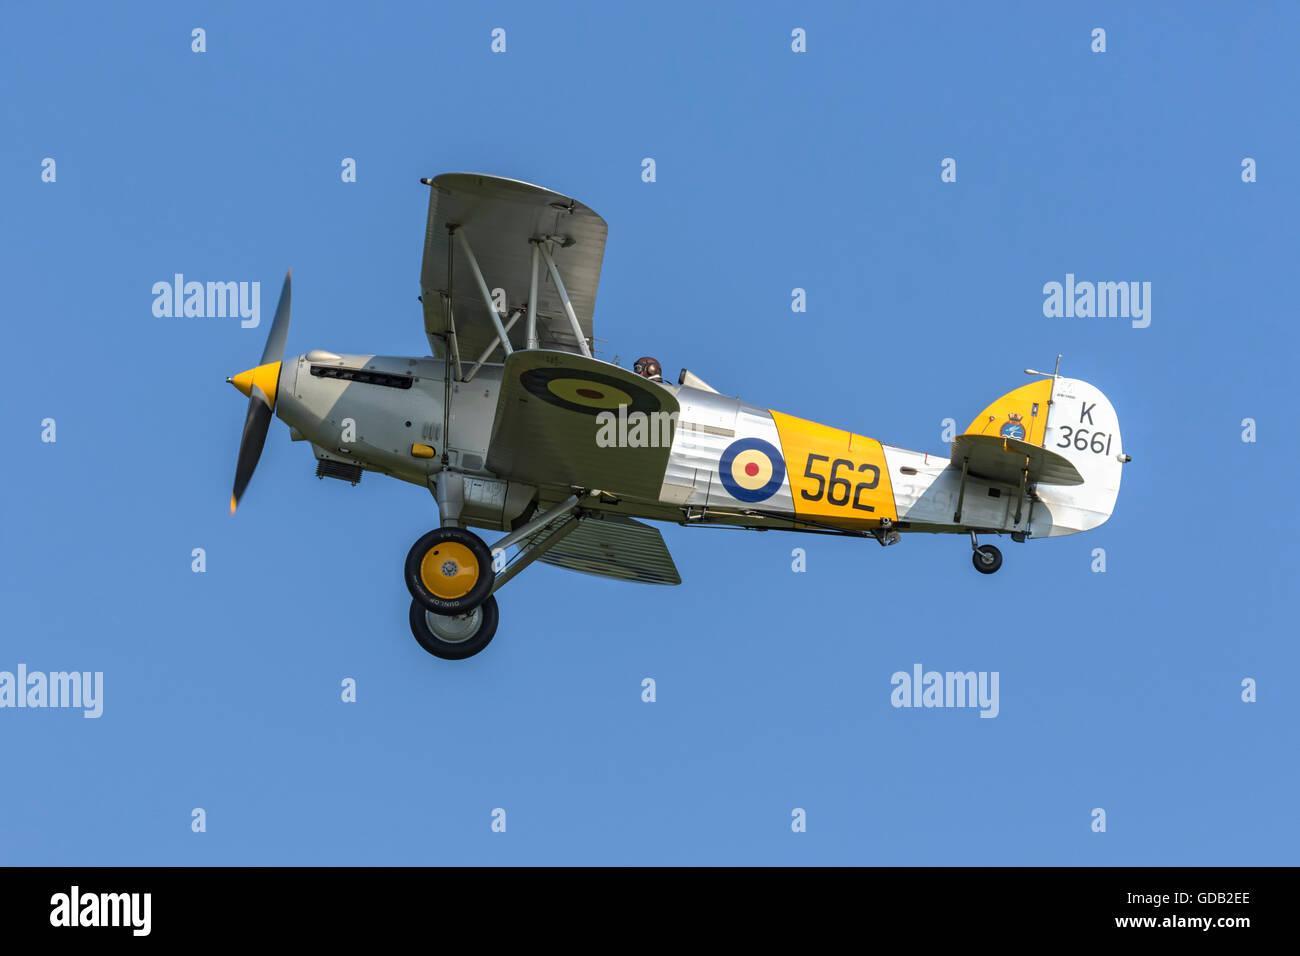 Hawker Nimrod 2 - RAF bi-plane fighter - Stock Image